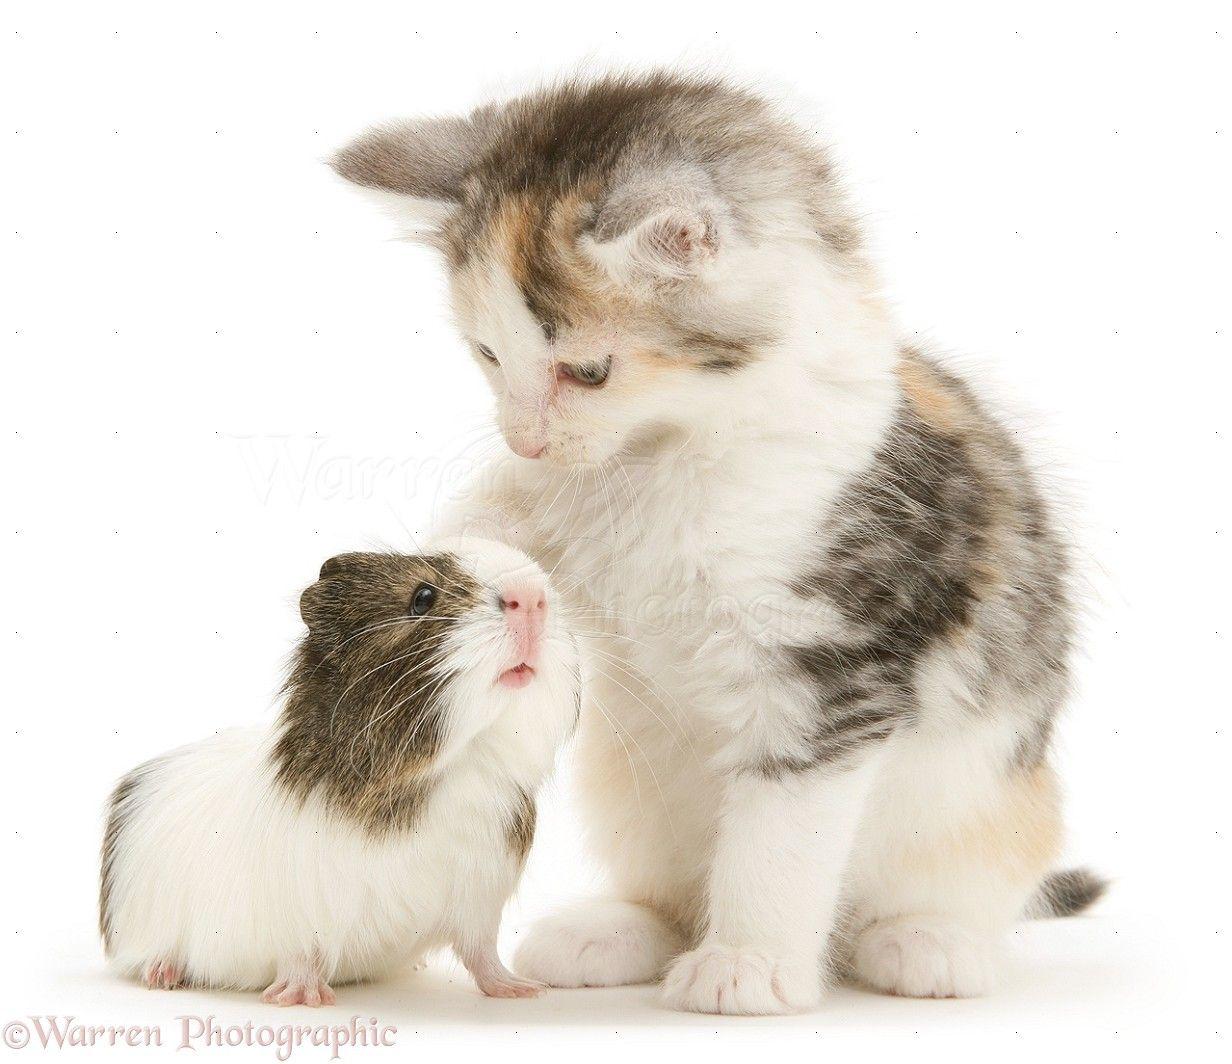 Pin on Animals [Odd Couples]